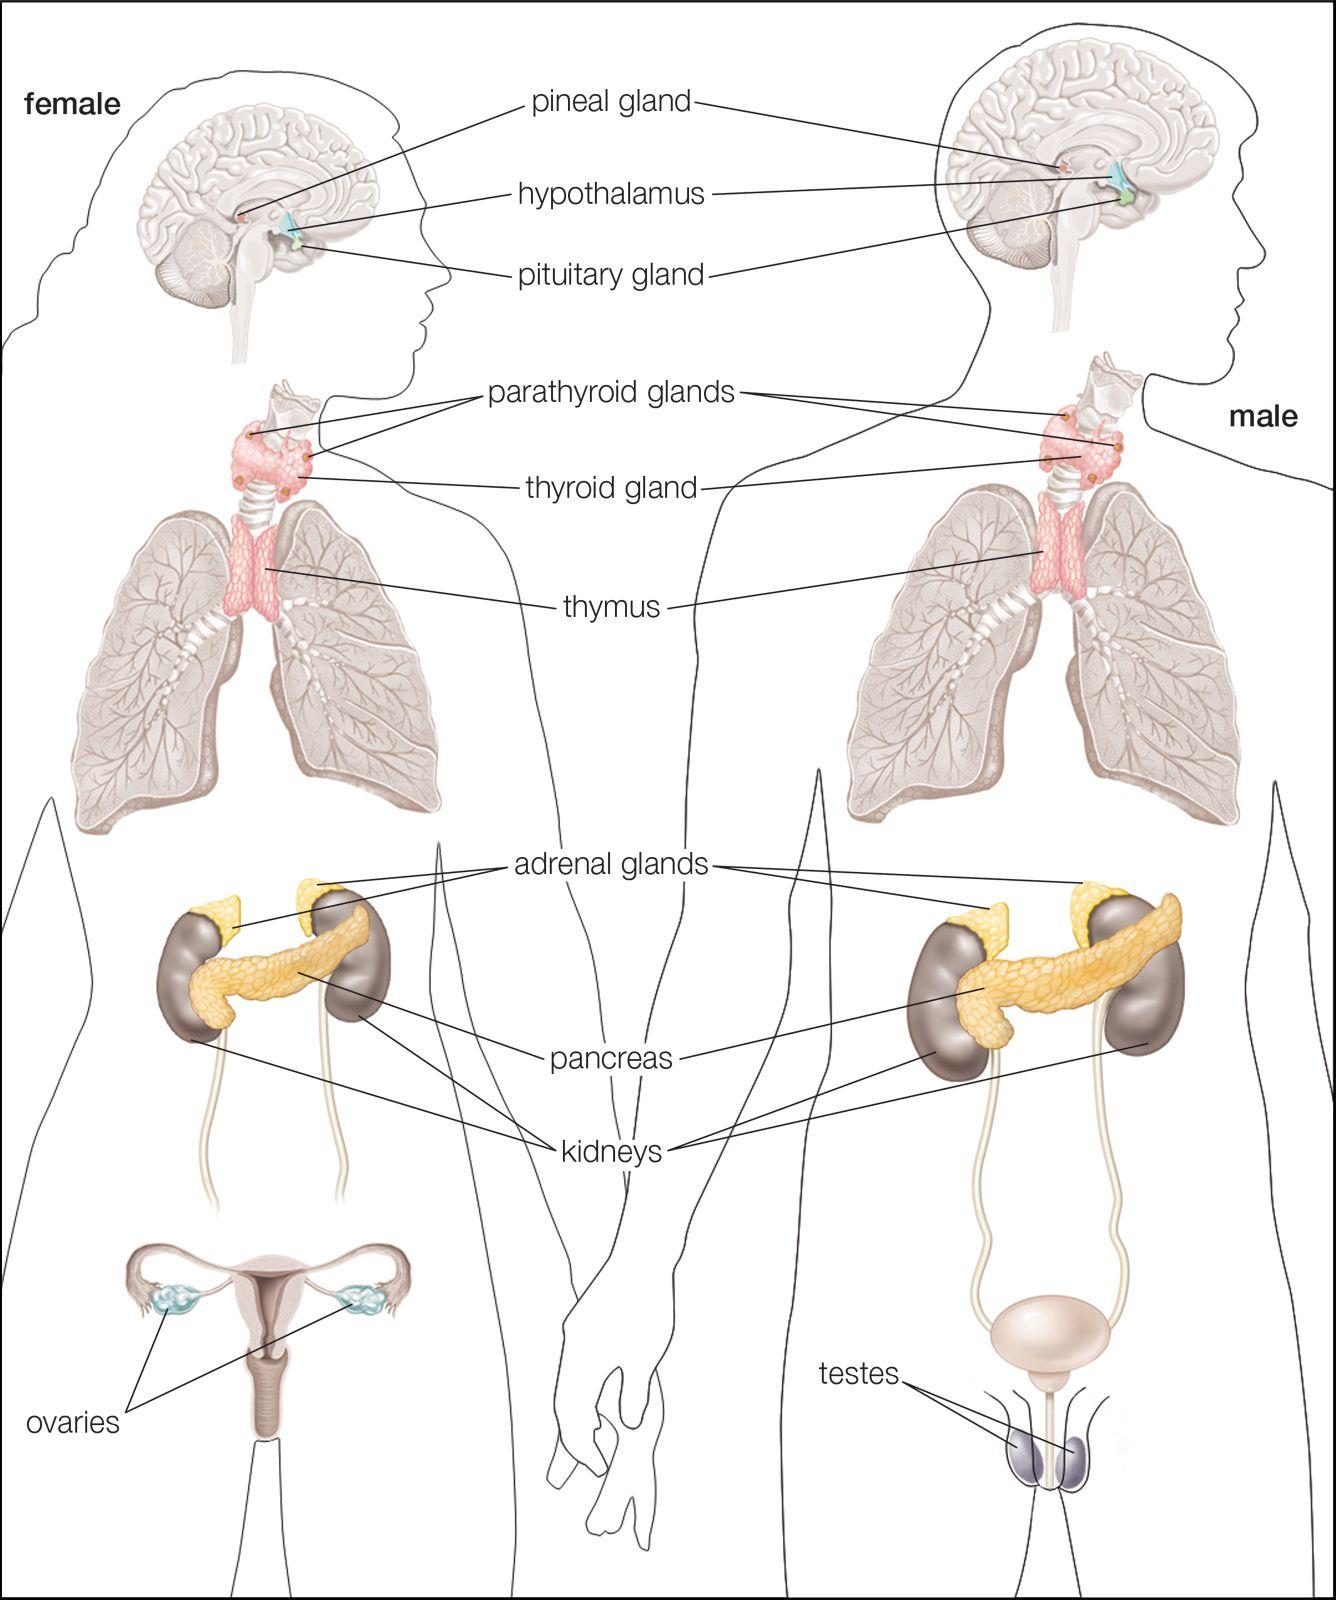 Endocrine System Human Glands Of The Human Endocrine System Art